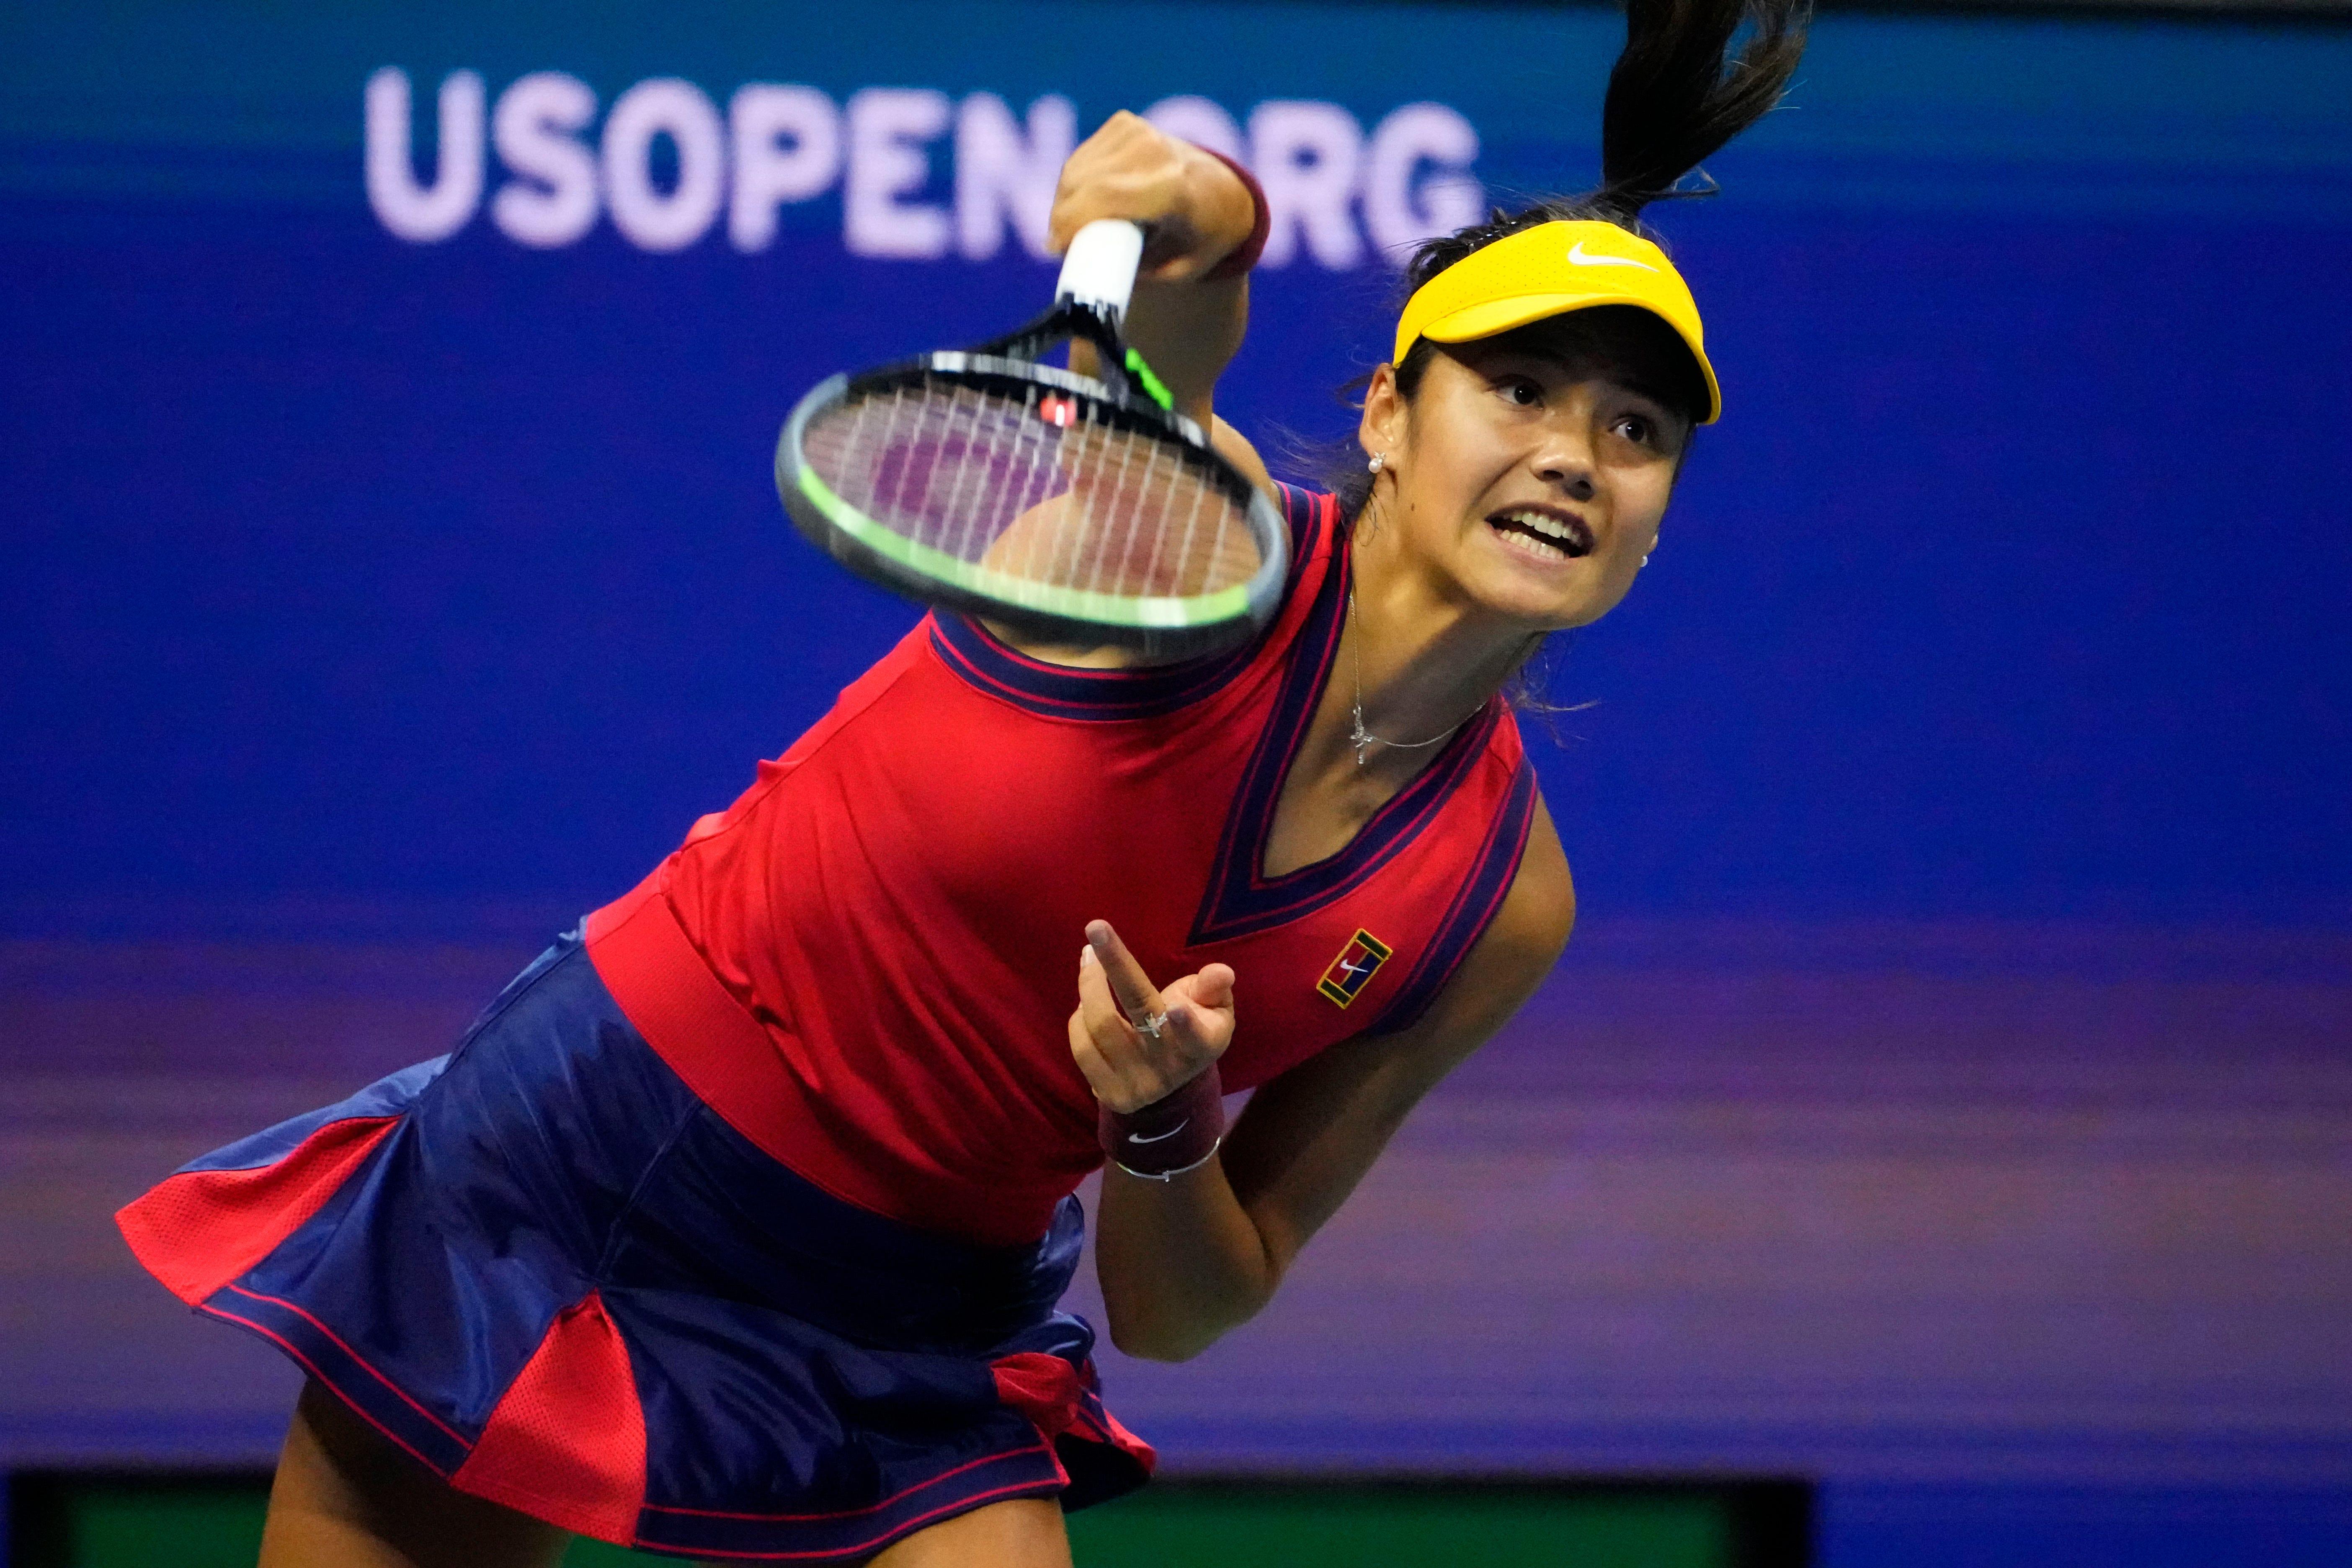 US Open: Emma Raducanu stifles Maria Sakkari to set up all-teenage women s final